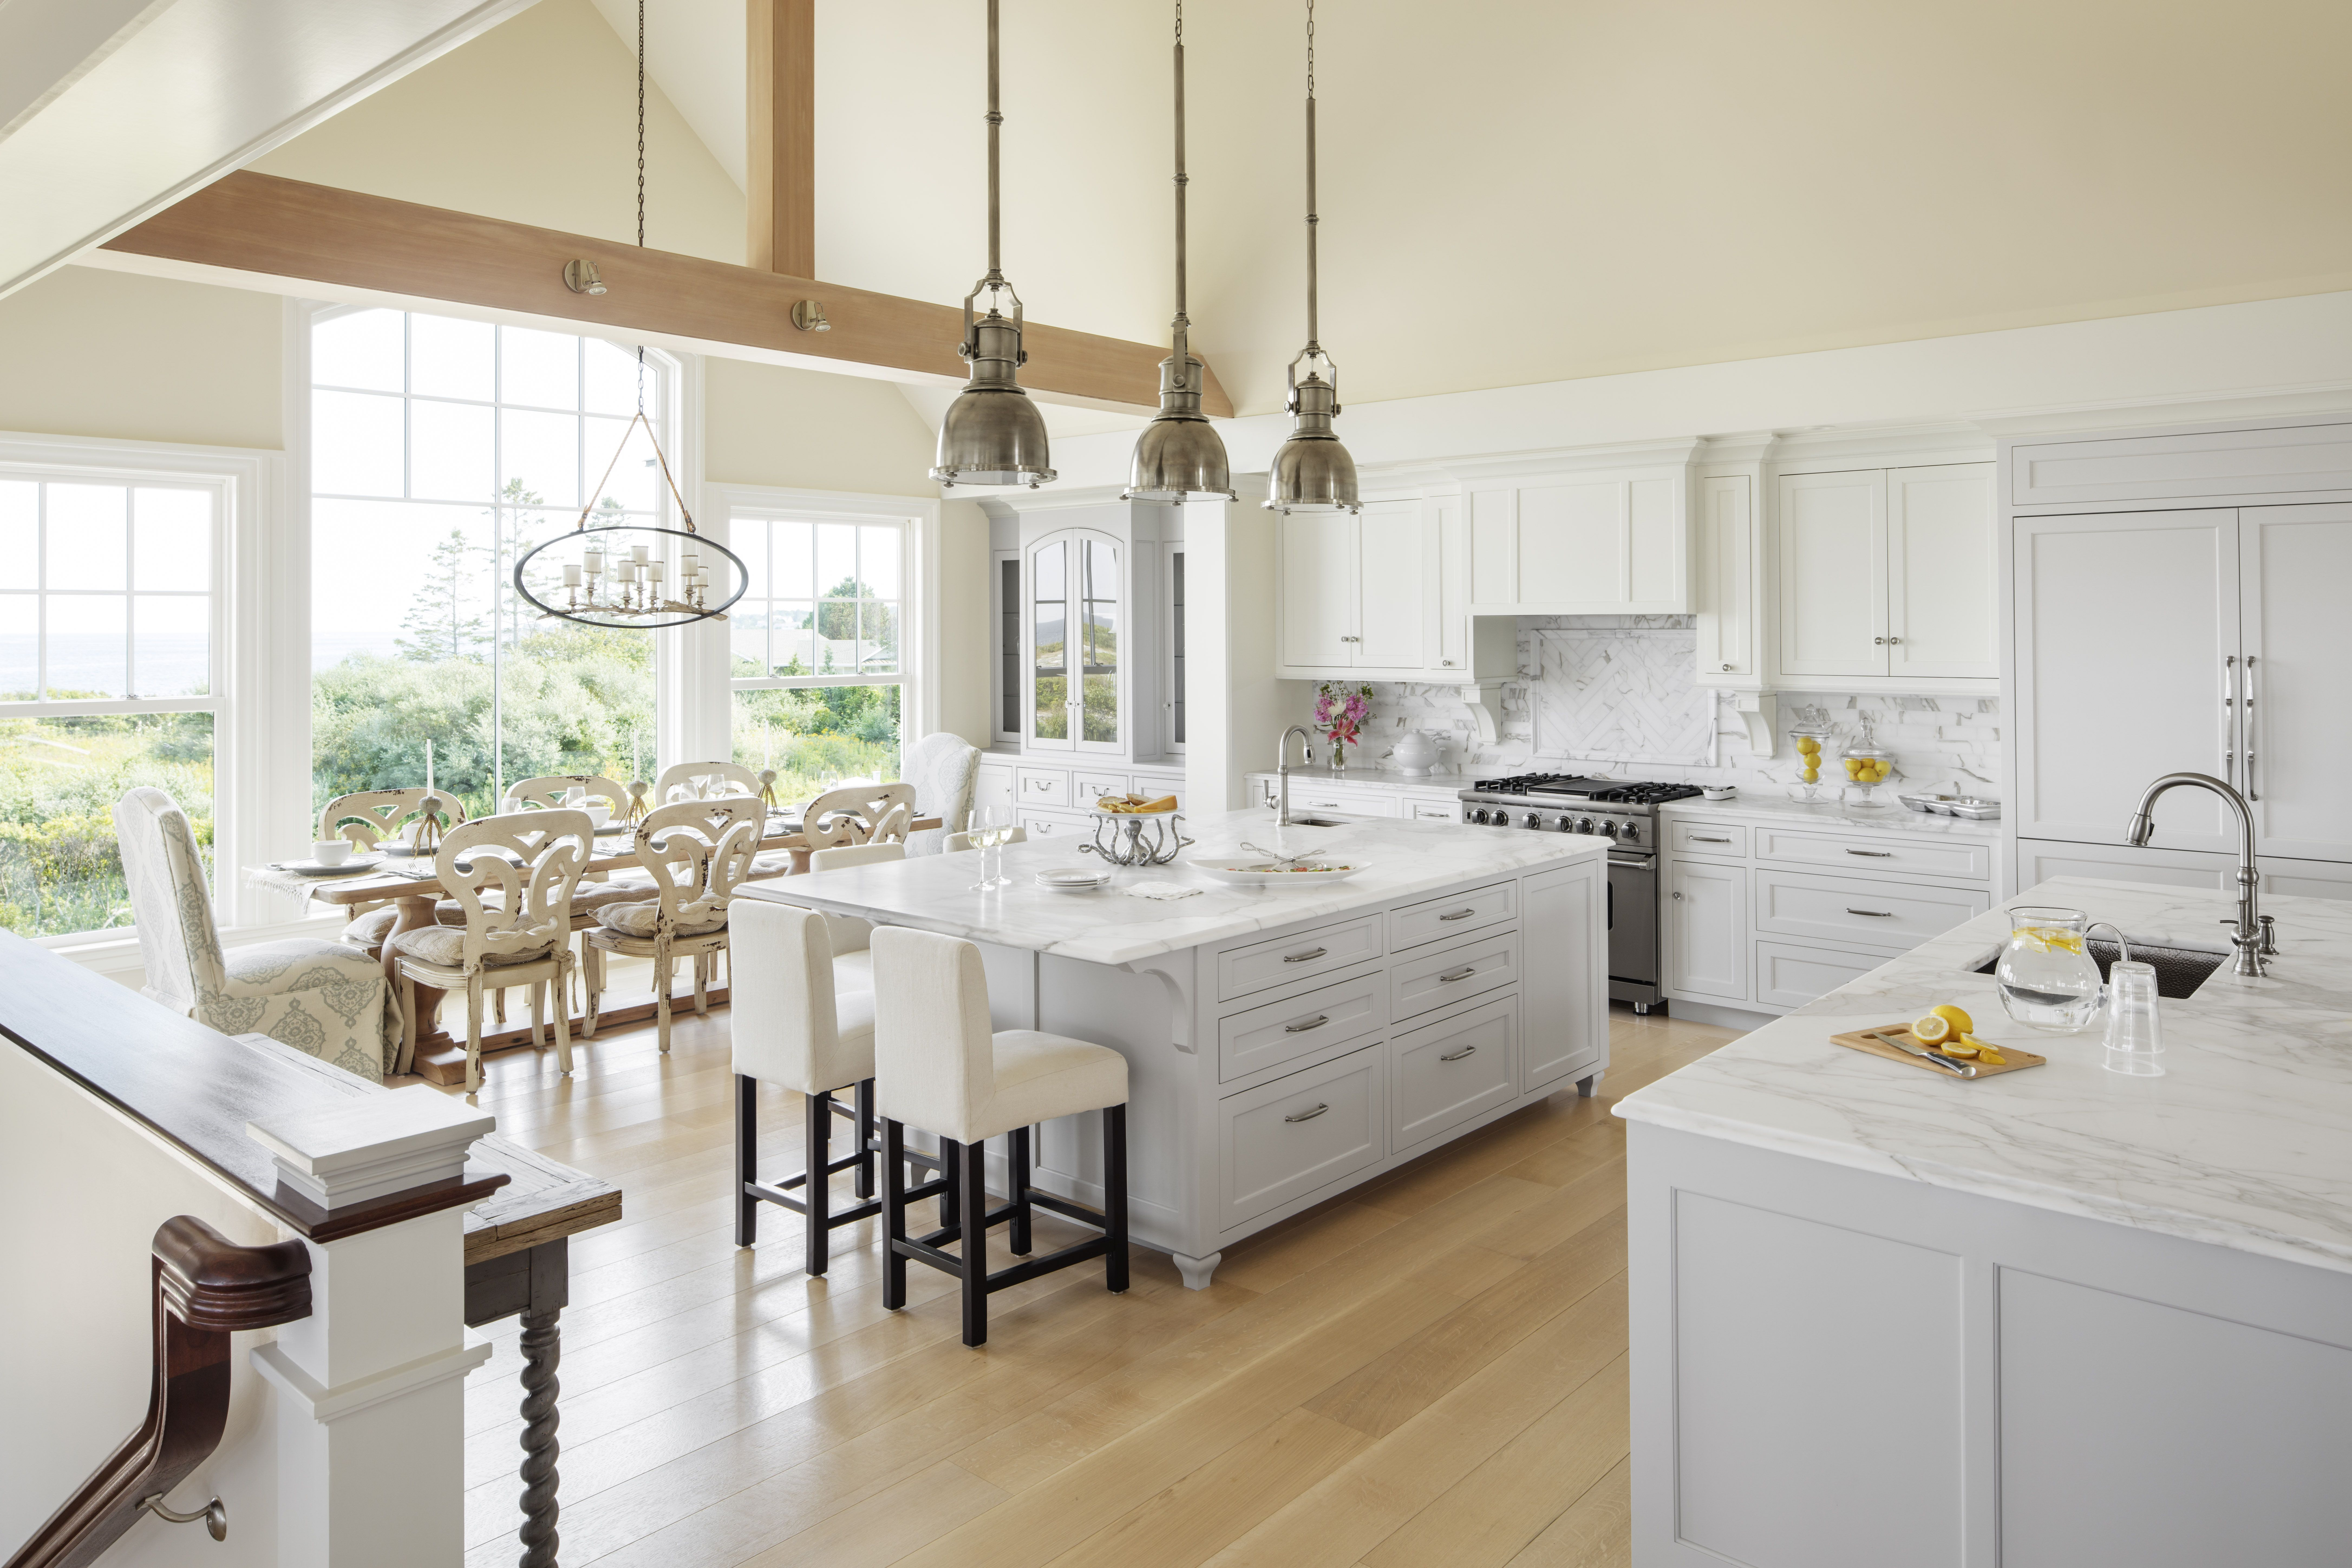 White Oak Floors In Kitchen Instaimage